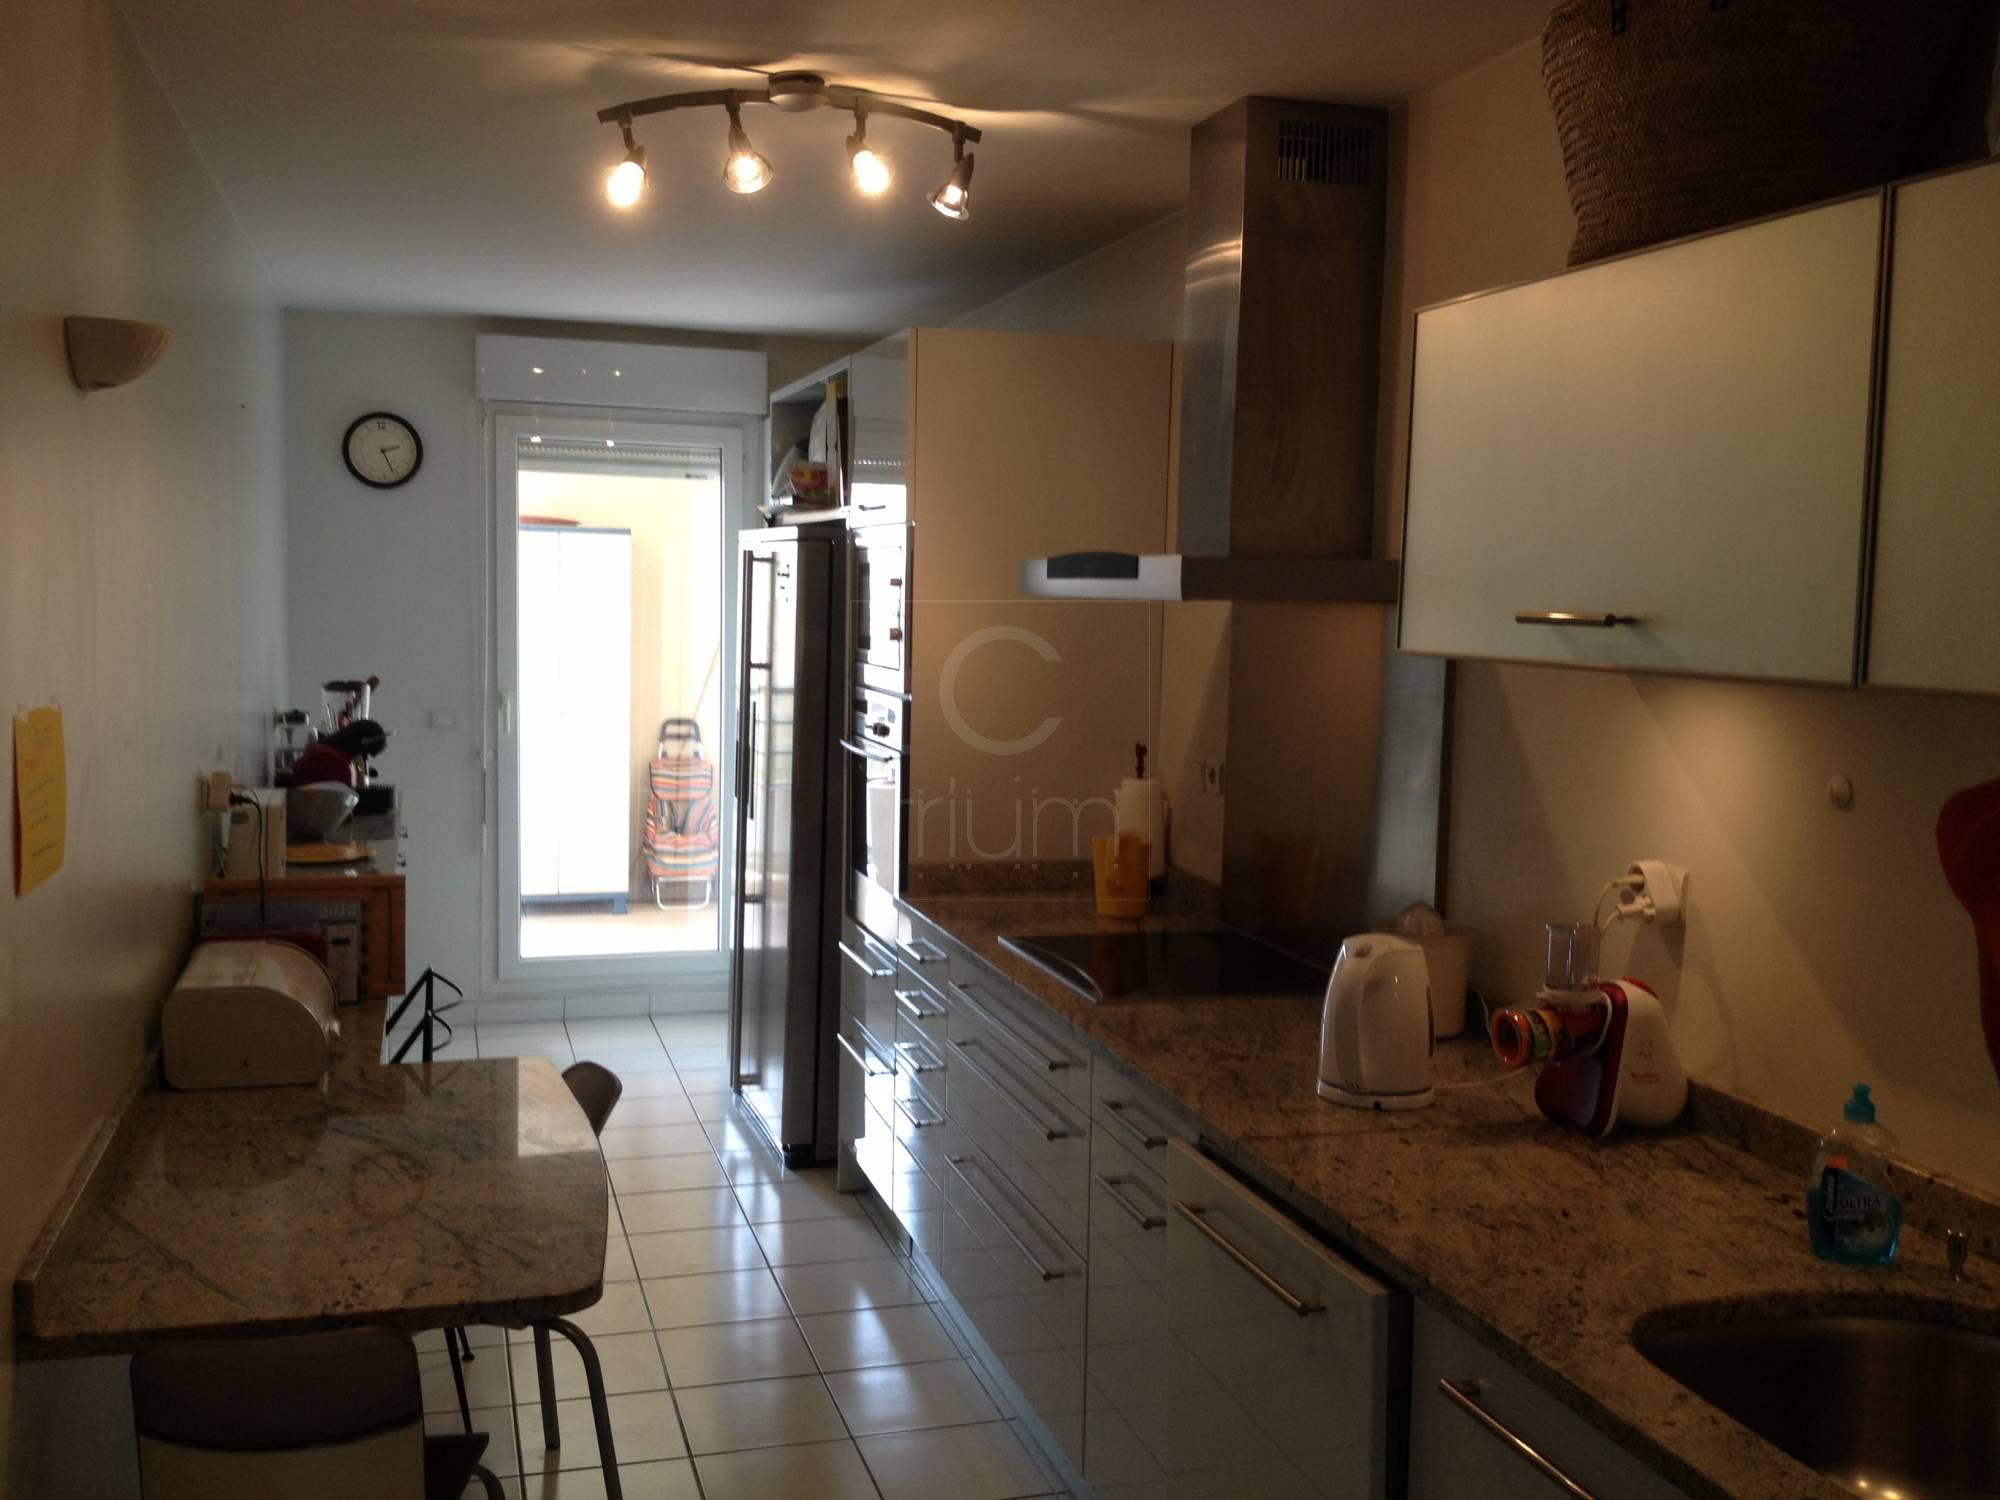 Vente appartement t4 f4 marseille 13006 proximit rue for Deco appartement f4